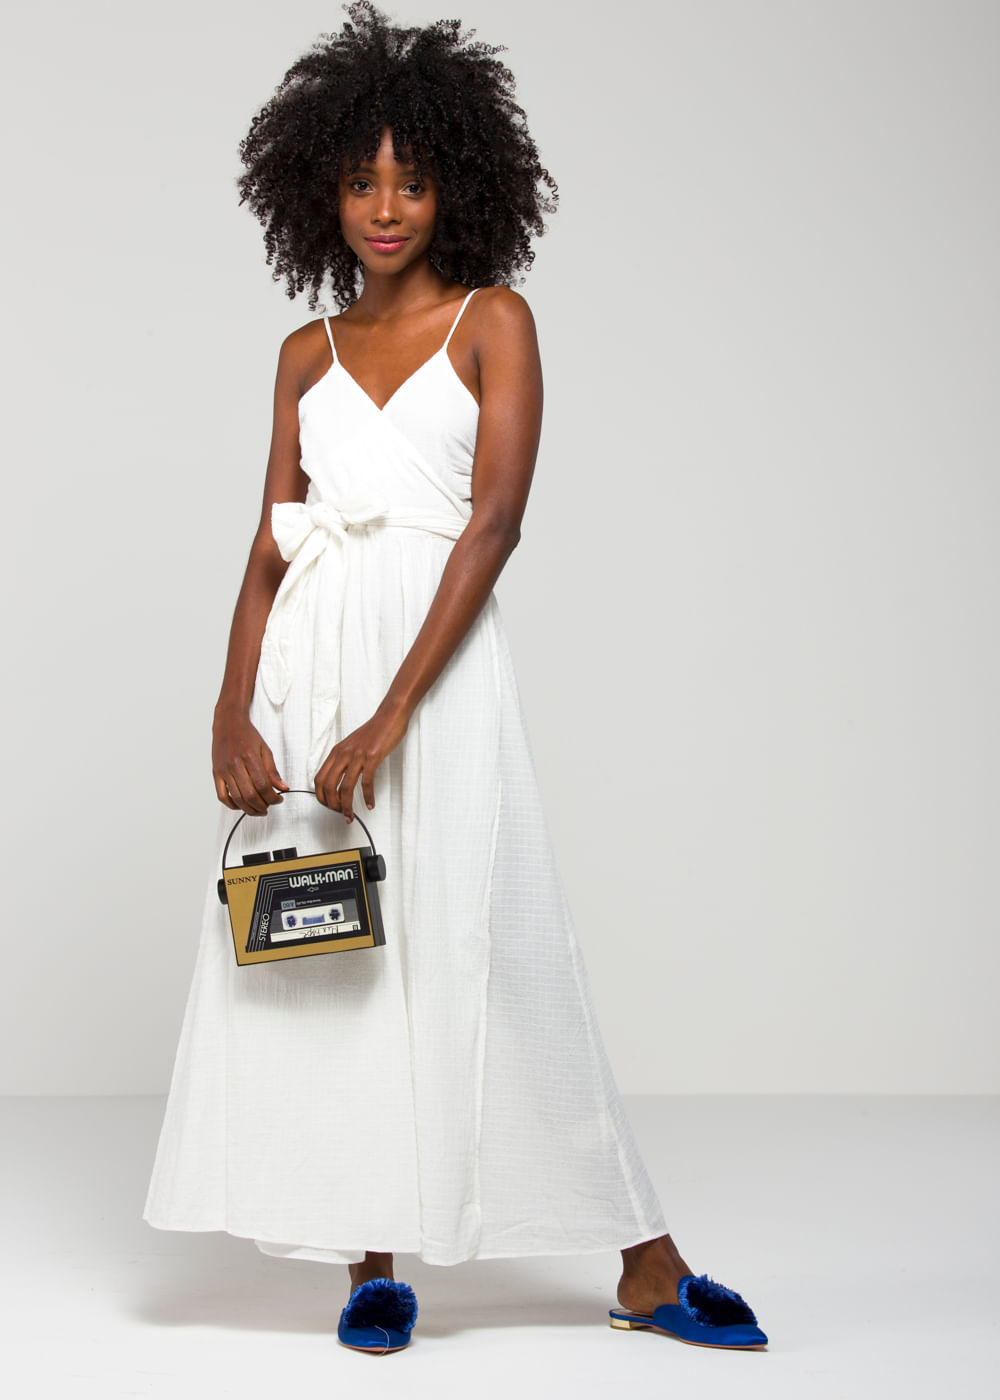 Vestido Longo De Algodão Alma Branco Branca G